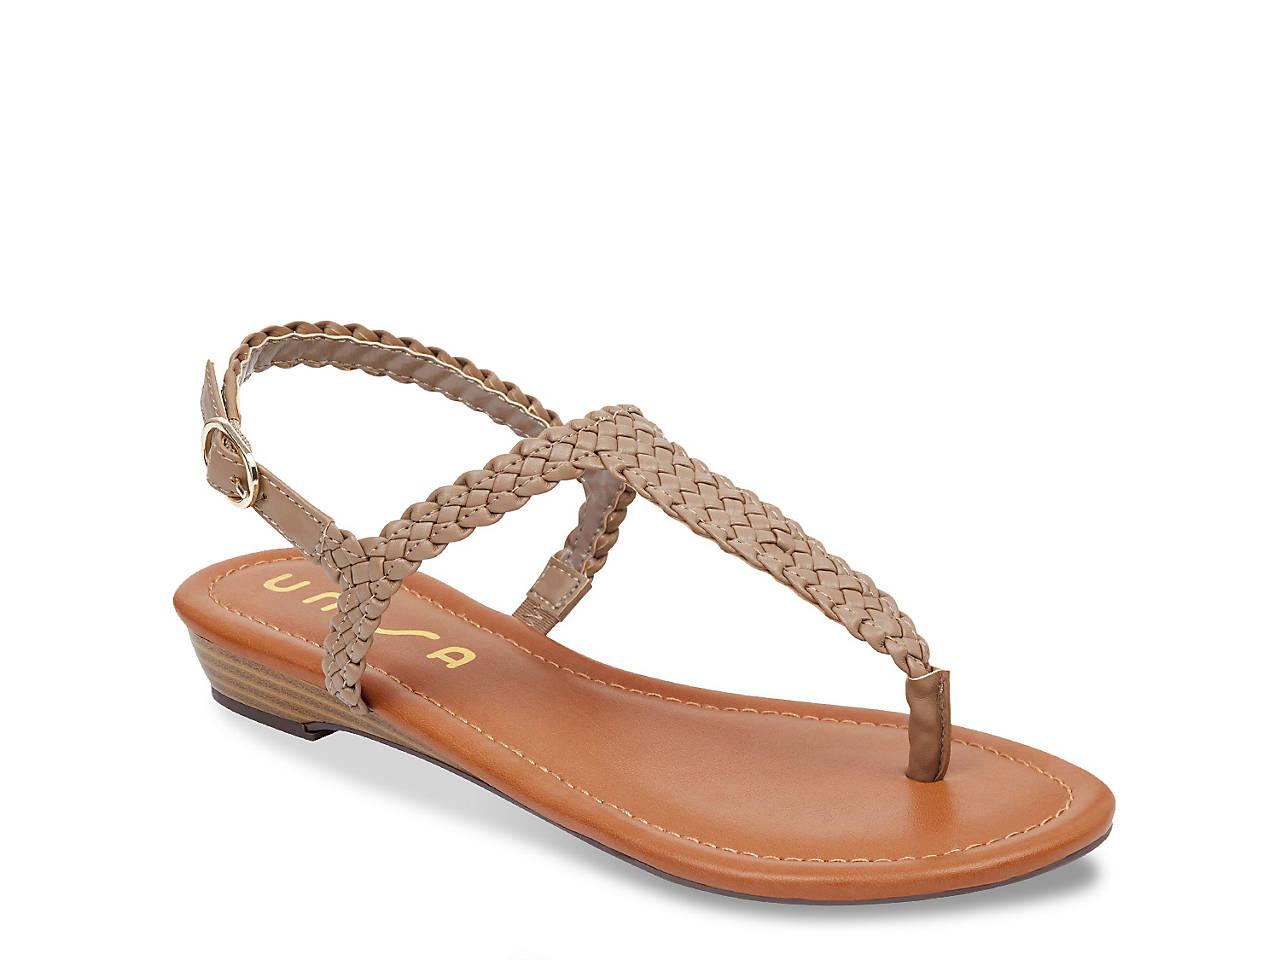 cb4b88ee871 Unisa Lilynda Flat Sandal Women s Shoes